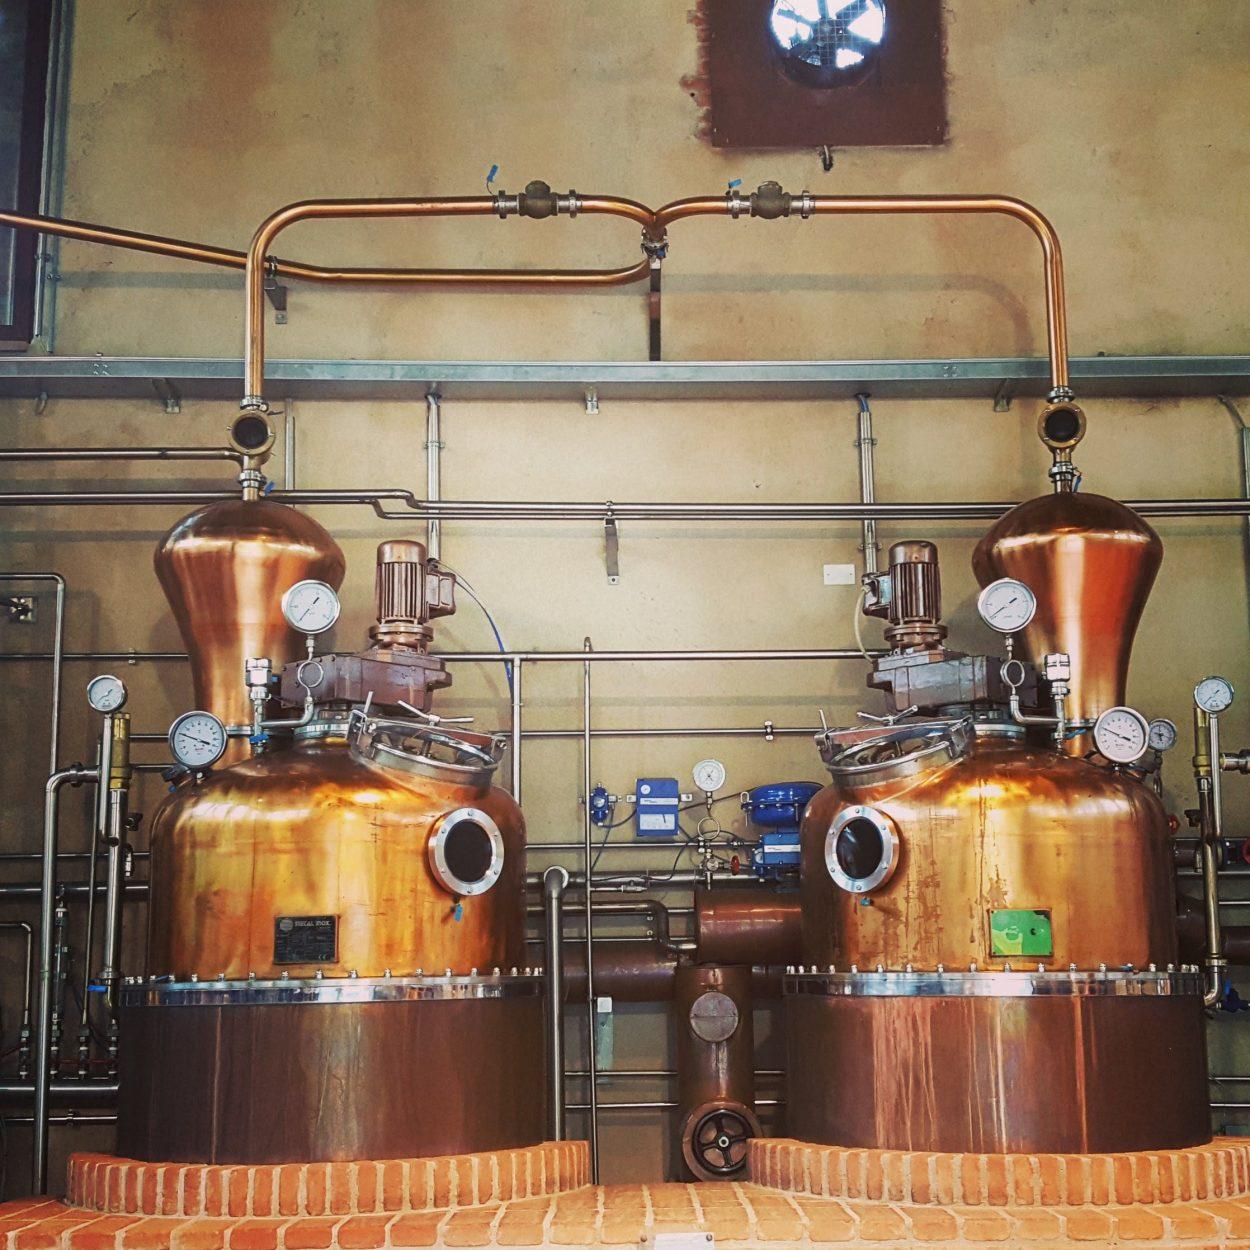 Grapperie aperte, distilleria